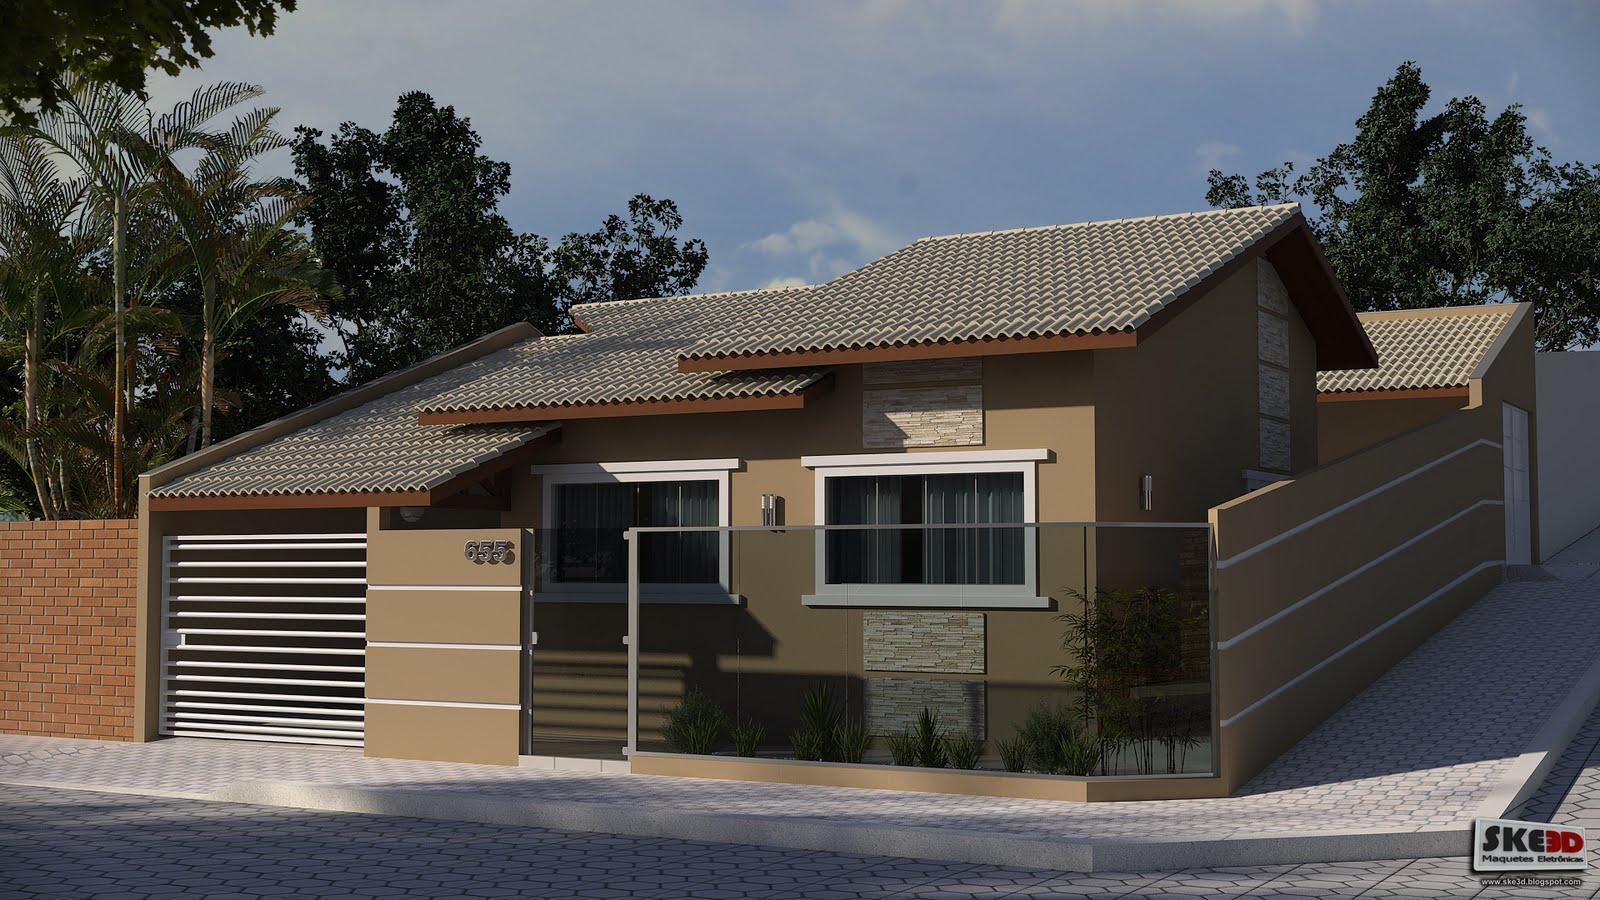 Projetos de casas de esquina for Modelos de casas procrear clasica